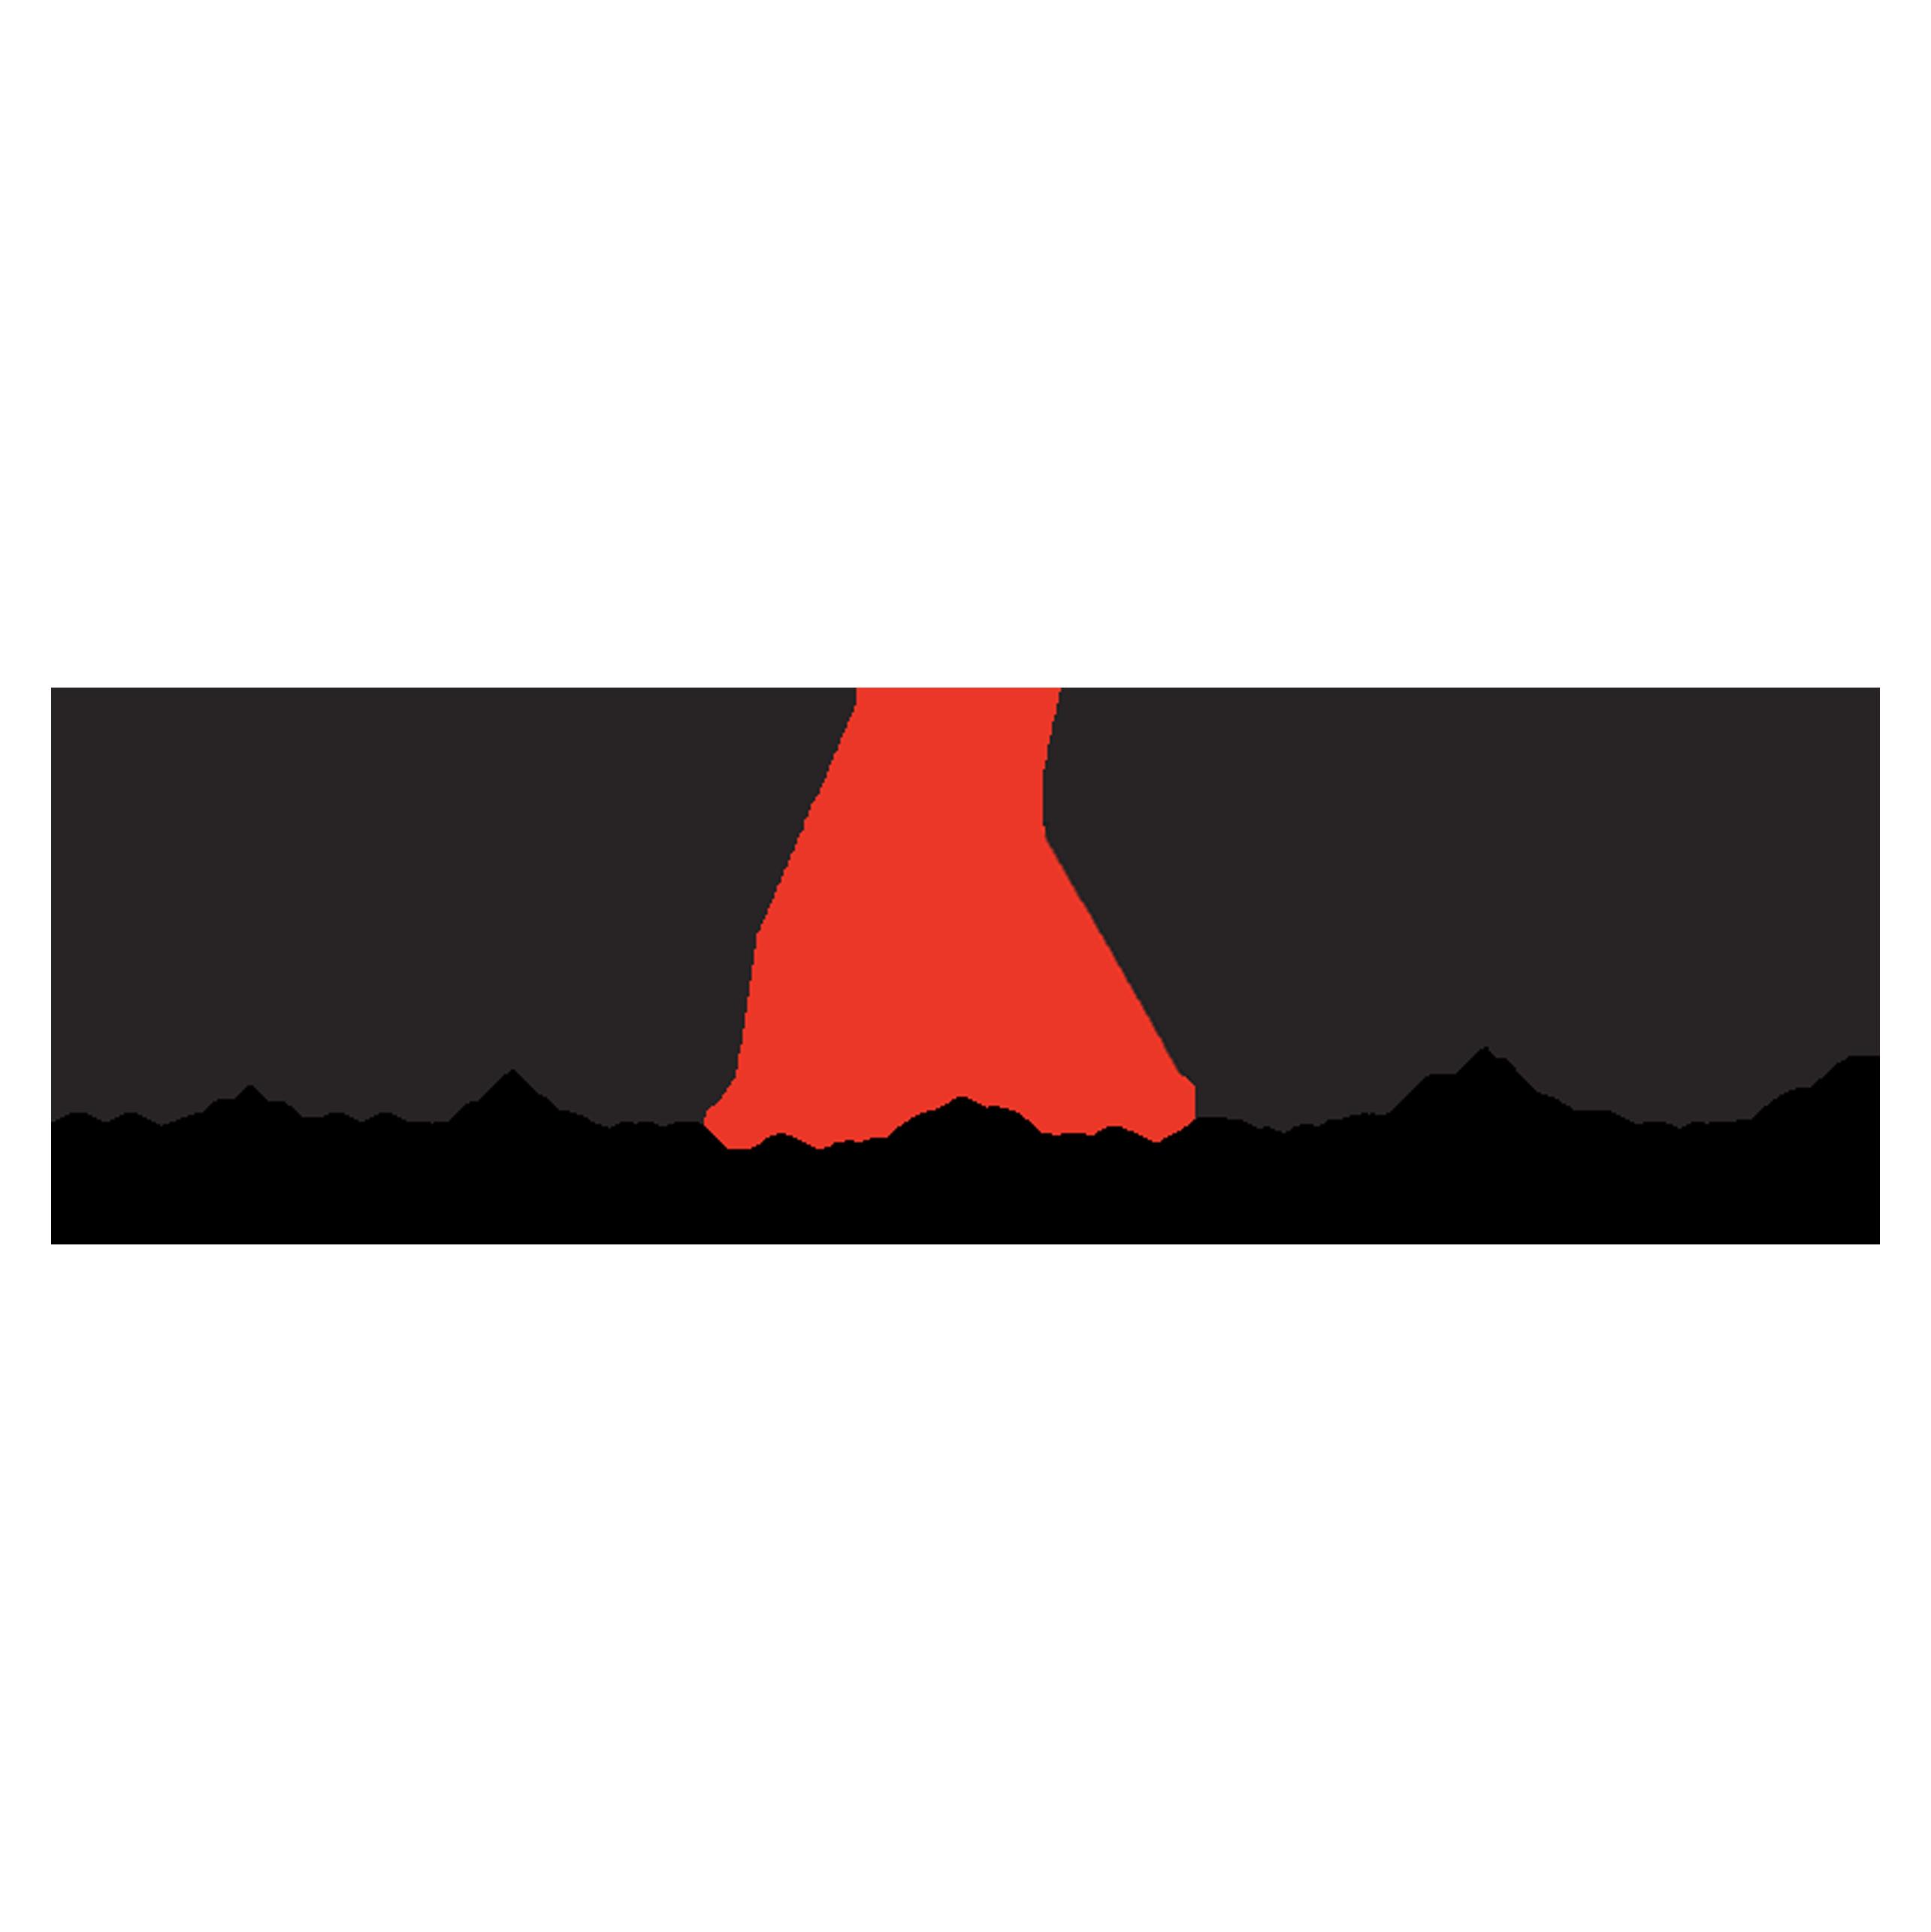 New Yorkers Againt Gun Violence (NYAGV) logo